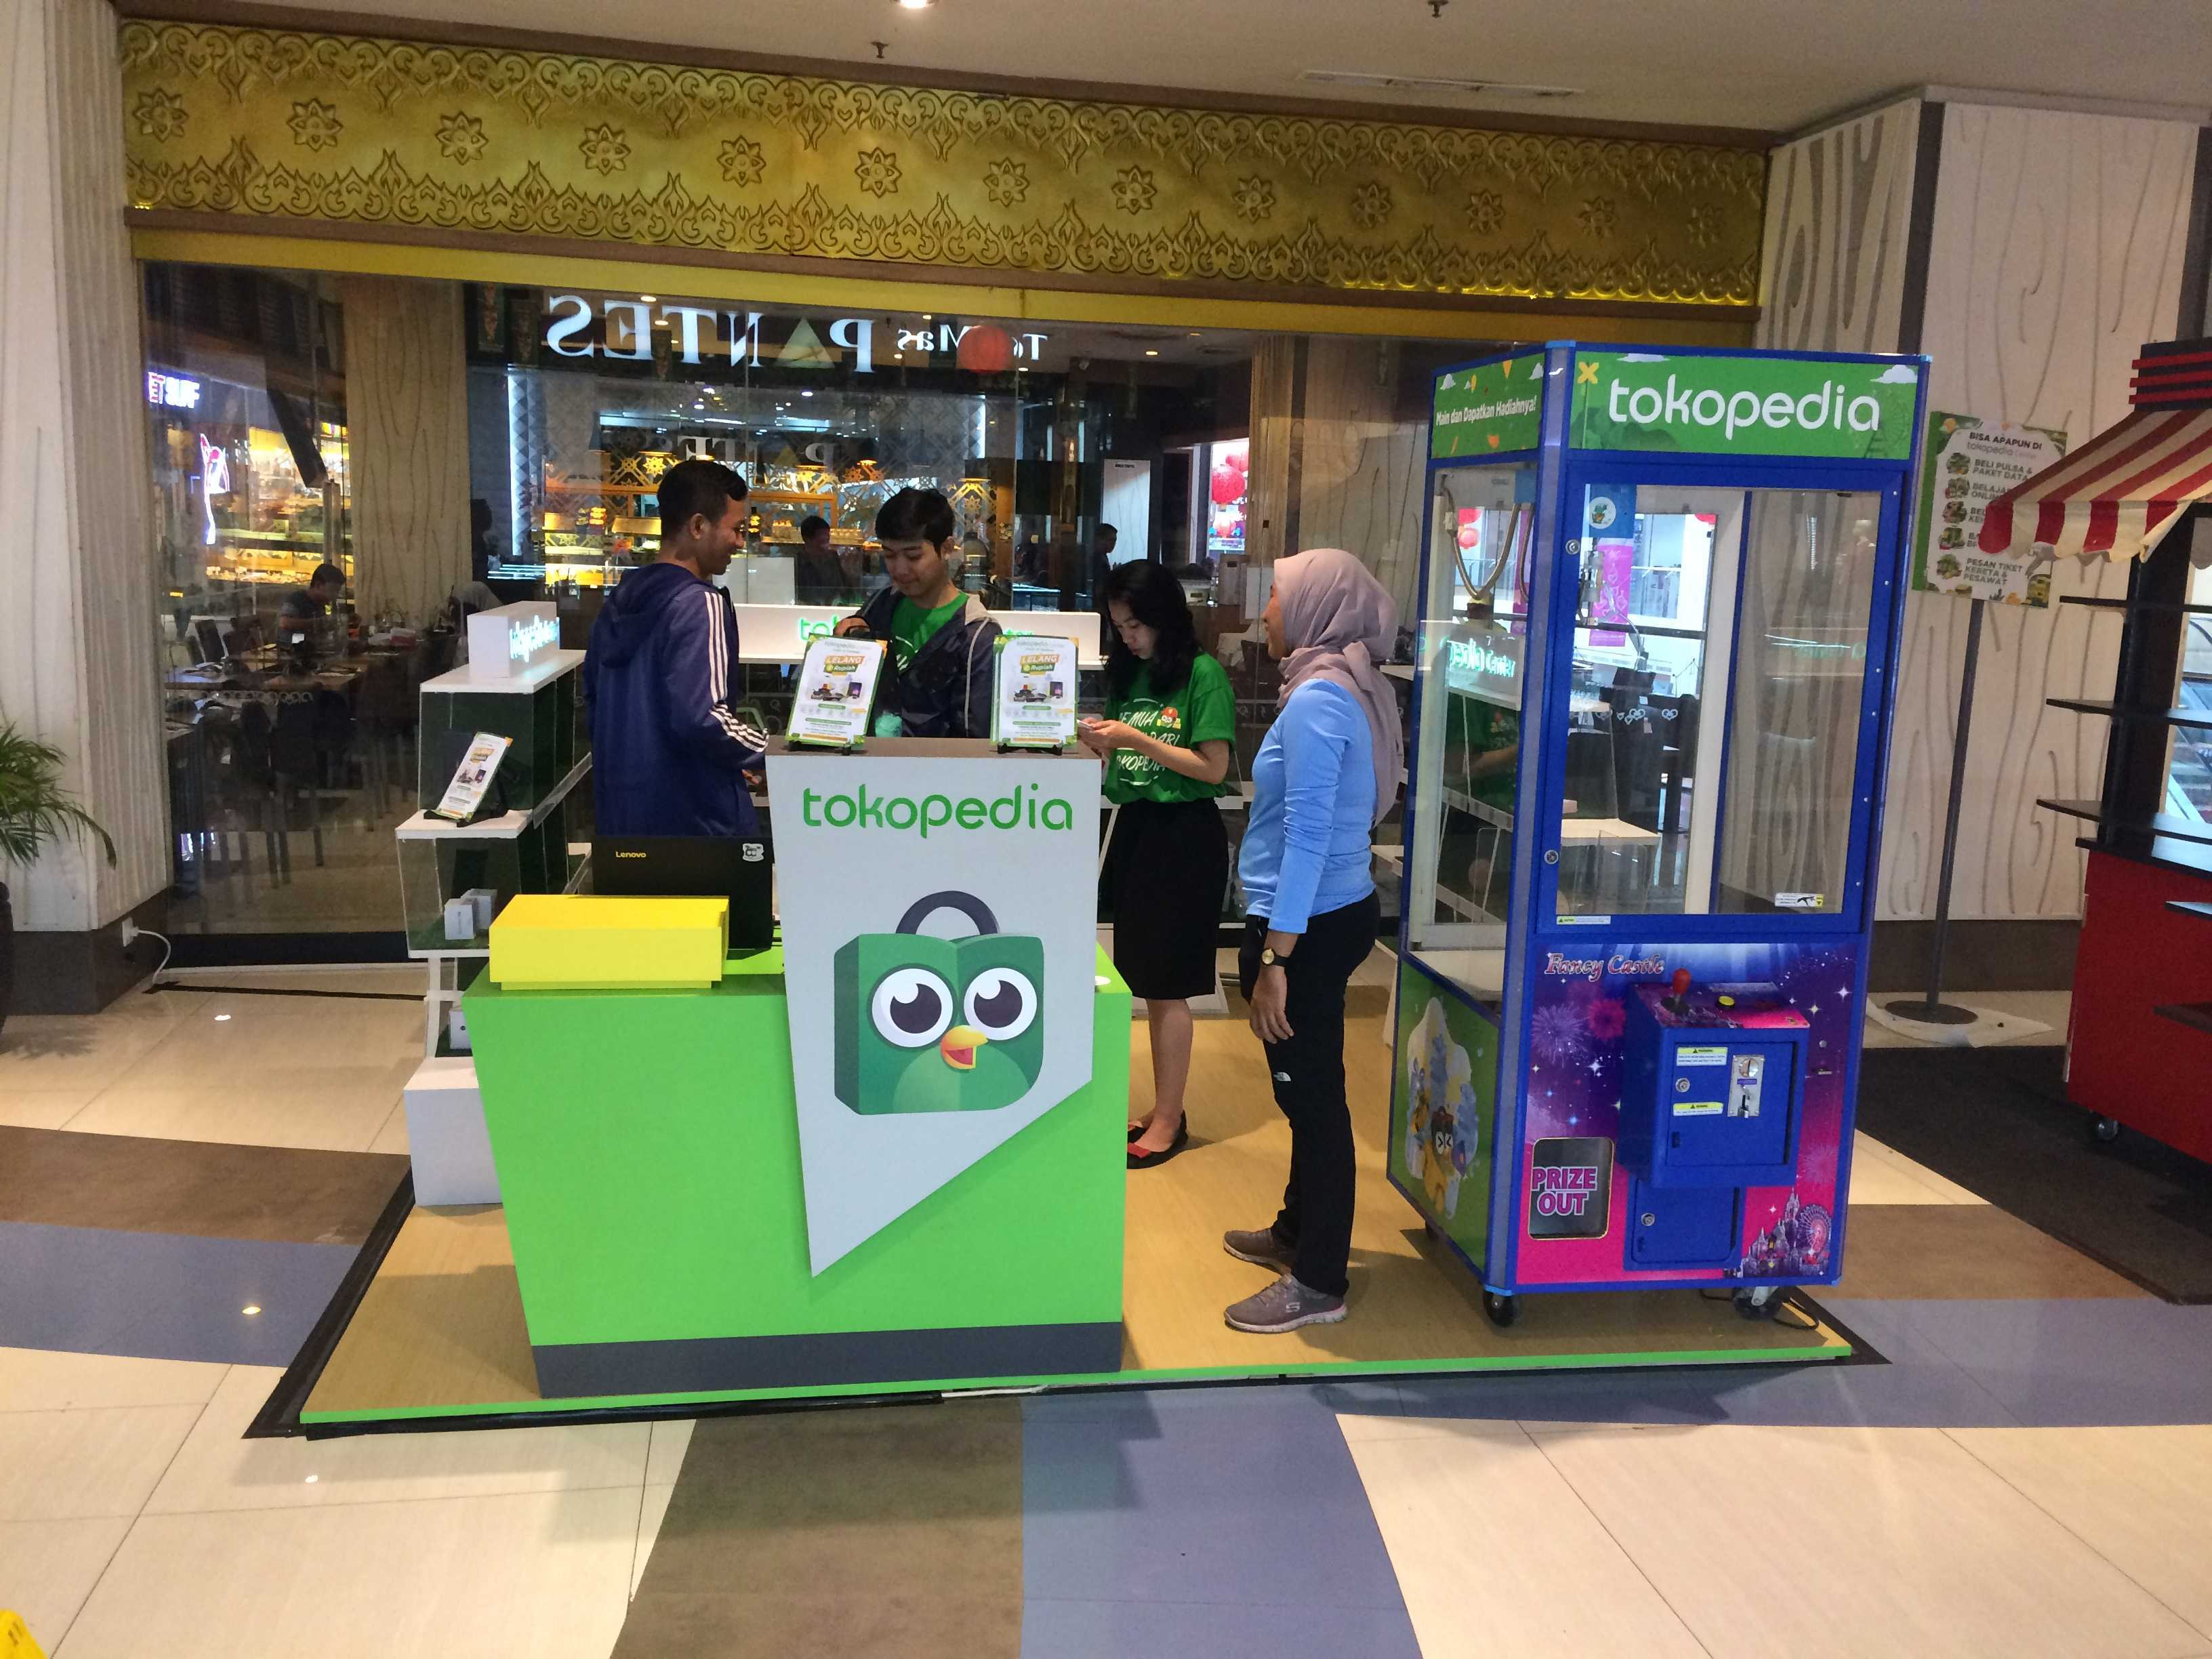 Pt.buana Pratama Interindo Tokopedia Retail Cirebon, Kota Cirebon, Jawa Barat, Indonesia Cirebon, Kota Cirebon, Jawa Barat, Indonesia Ptbuana-Pratama-Interindo-Tokopedia-Retail   67125